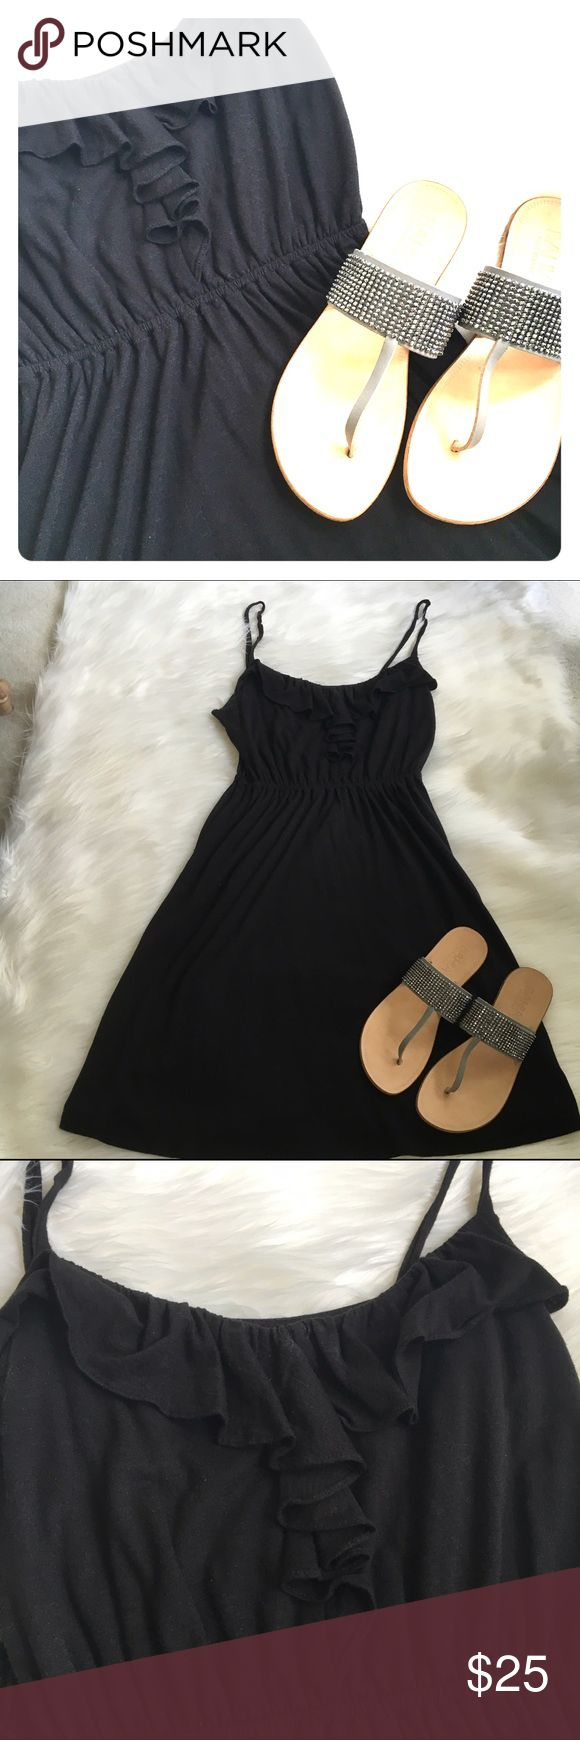 Loft cotton sundress Black sundress with ruffle bodice in 60% cotton and 40% Modal by Loft. LOFT Dresses Midi